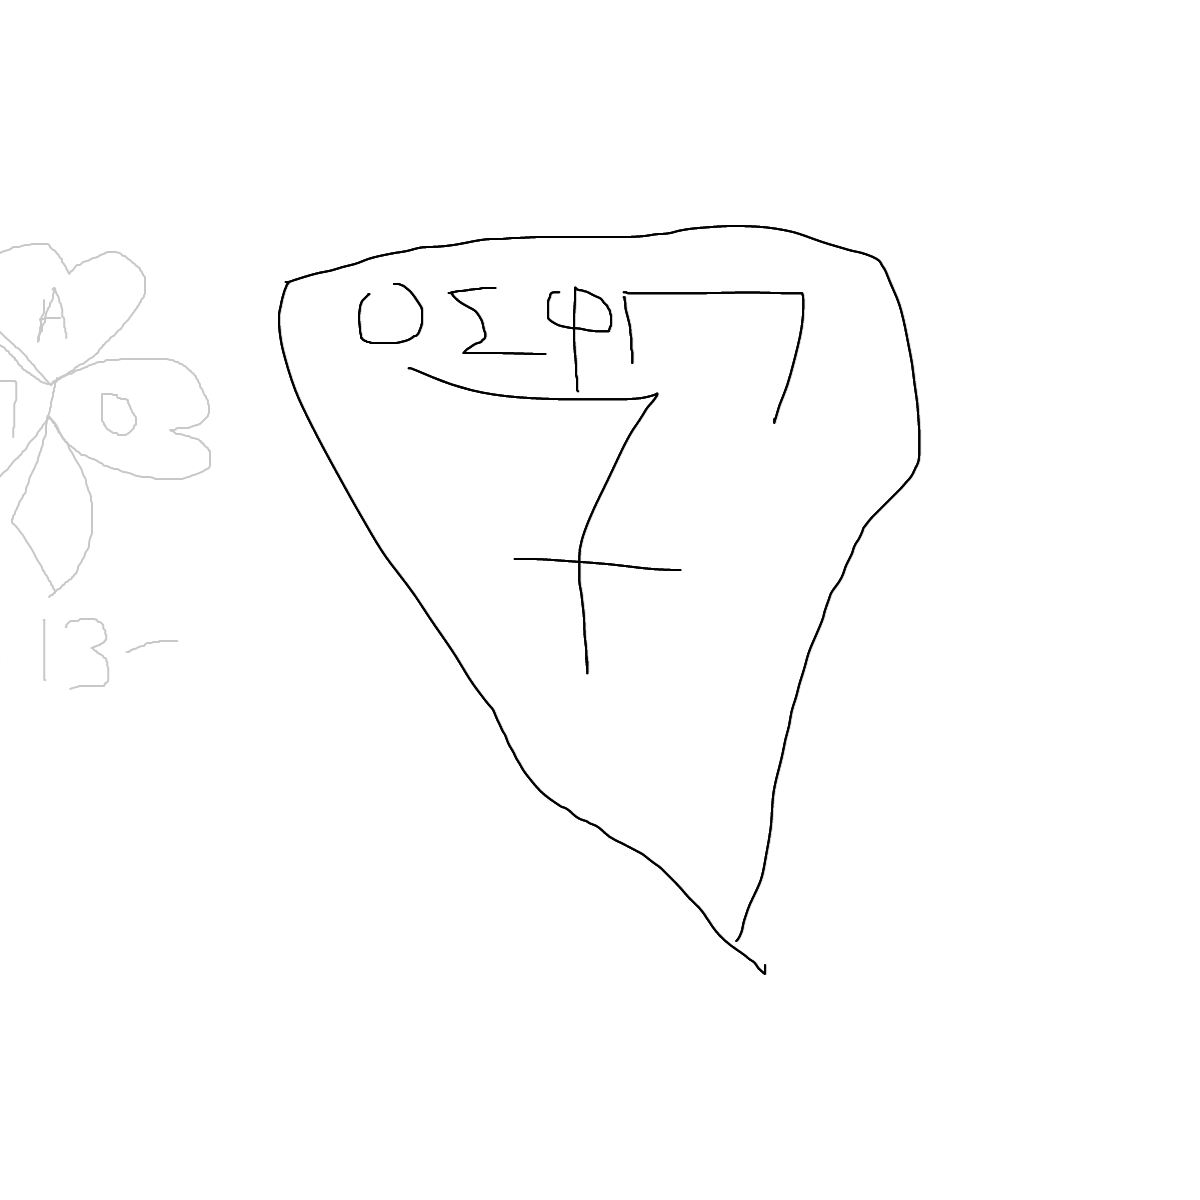 BAAAM drawing#5452 lat:38.0477027893066400lng: 23.7638397216796880